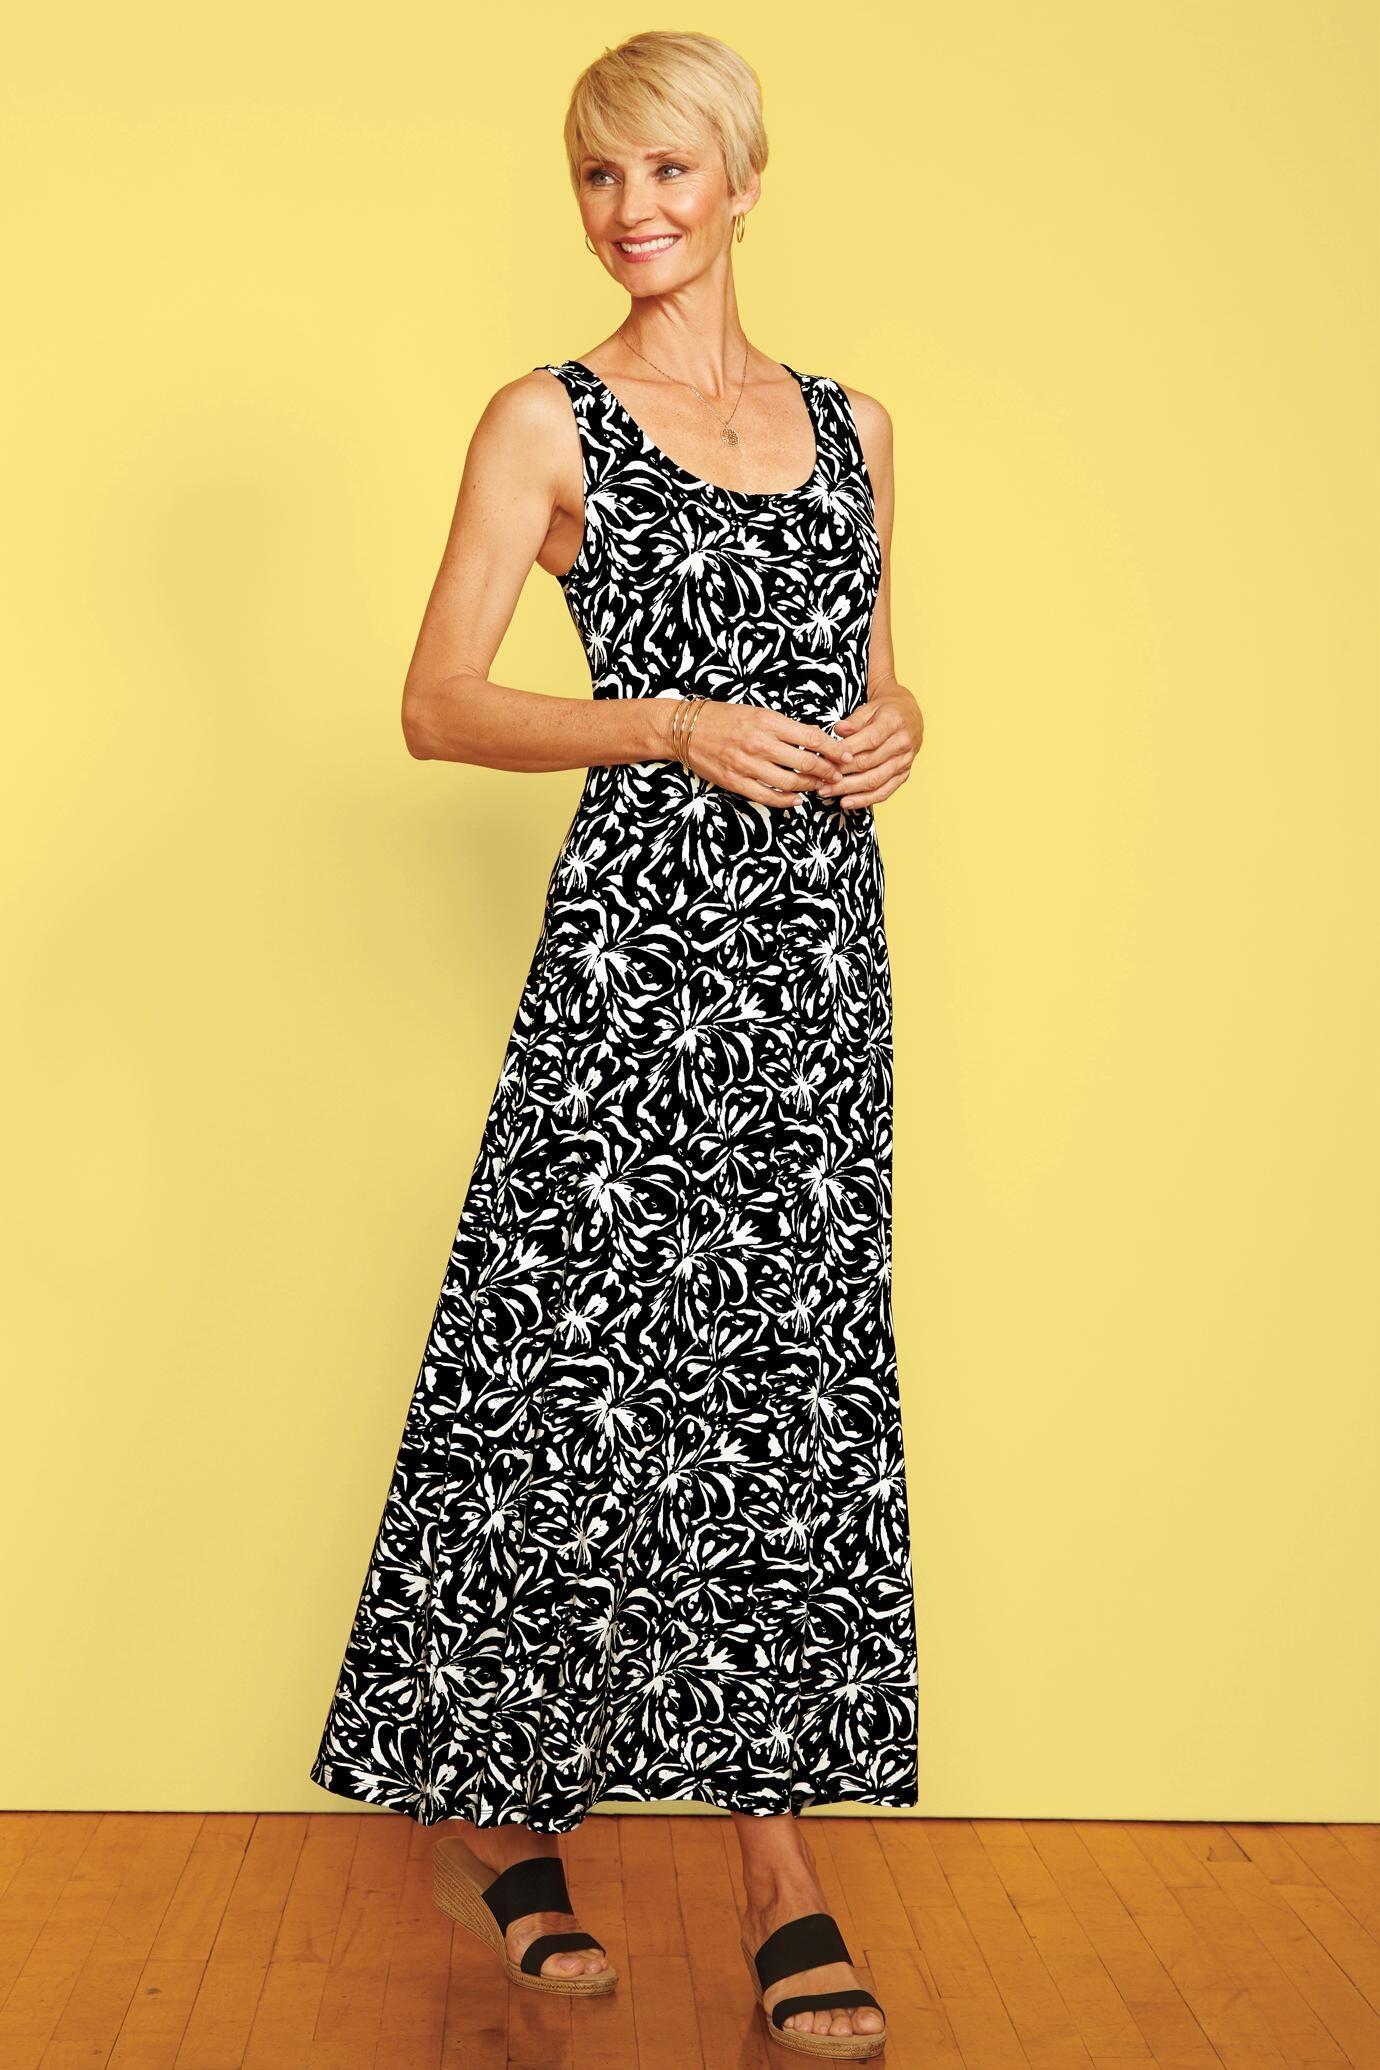 9682af7fa25 Traveler Knit Blossom Print Maxi Tank Dress   Travelsmith  89.95 -  99.95